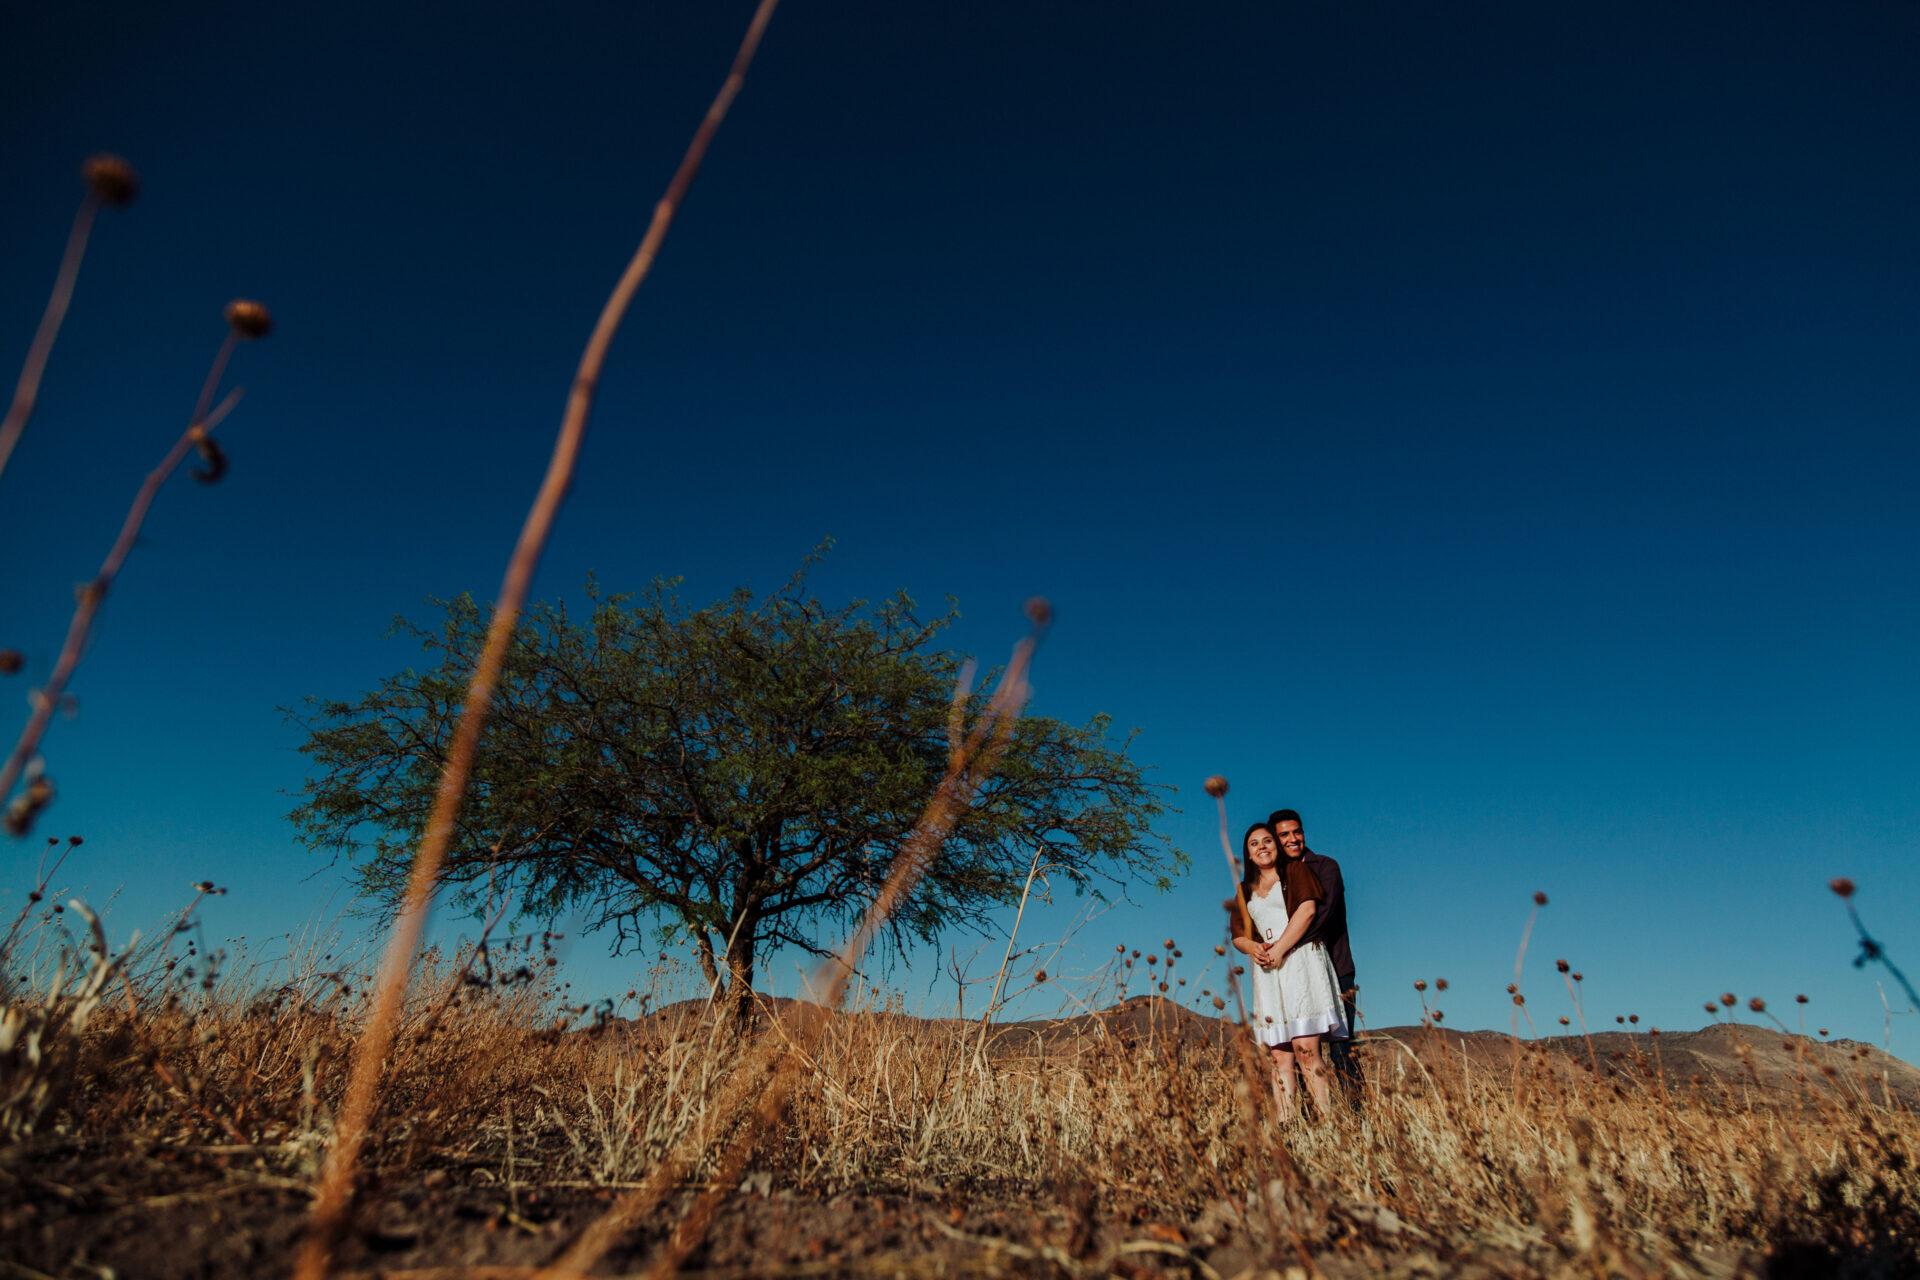 javier_noriega_fotografo_bodas_zacatecas_chihuahua_wedding_photographer2